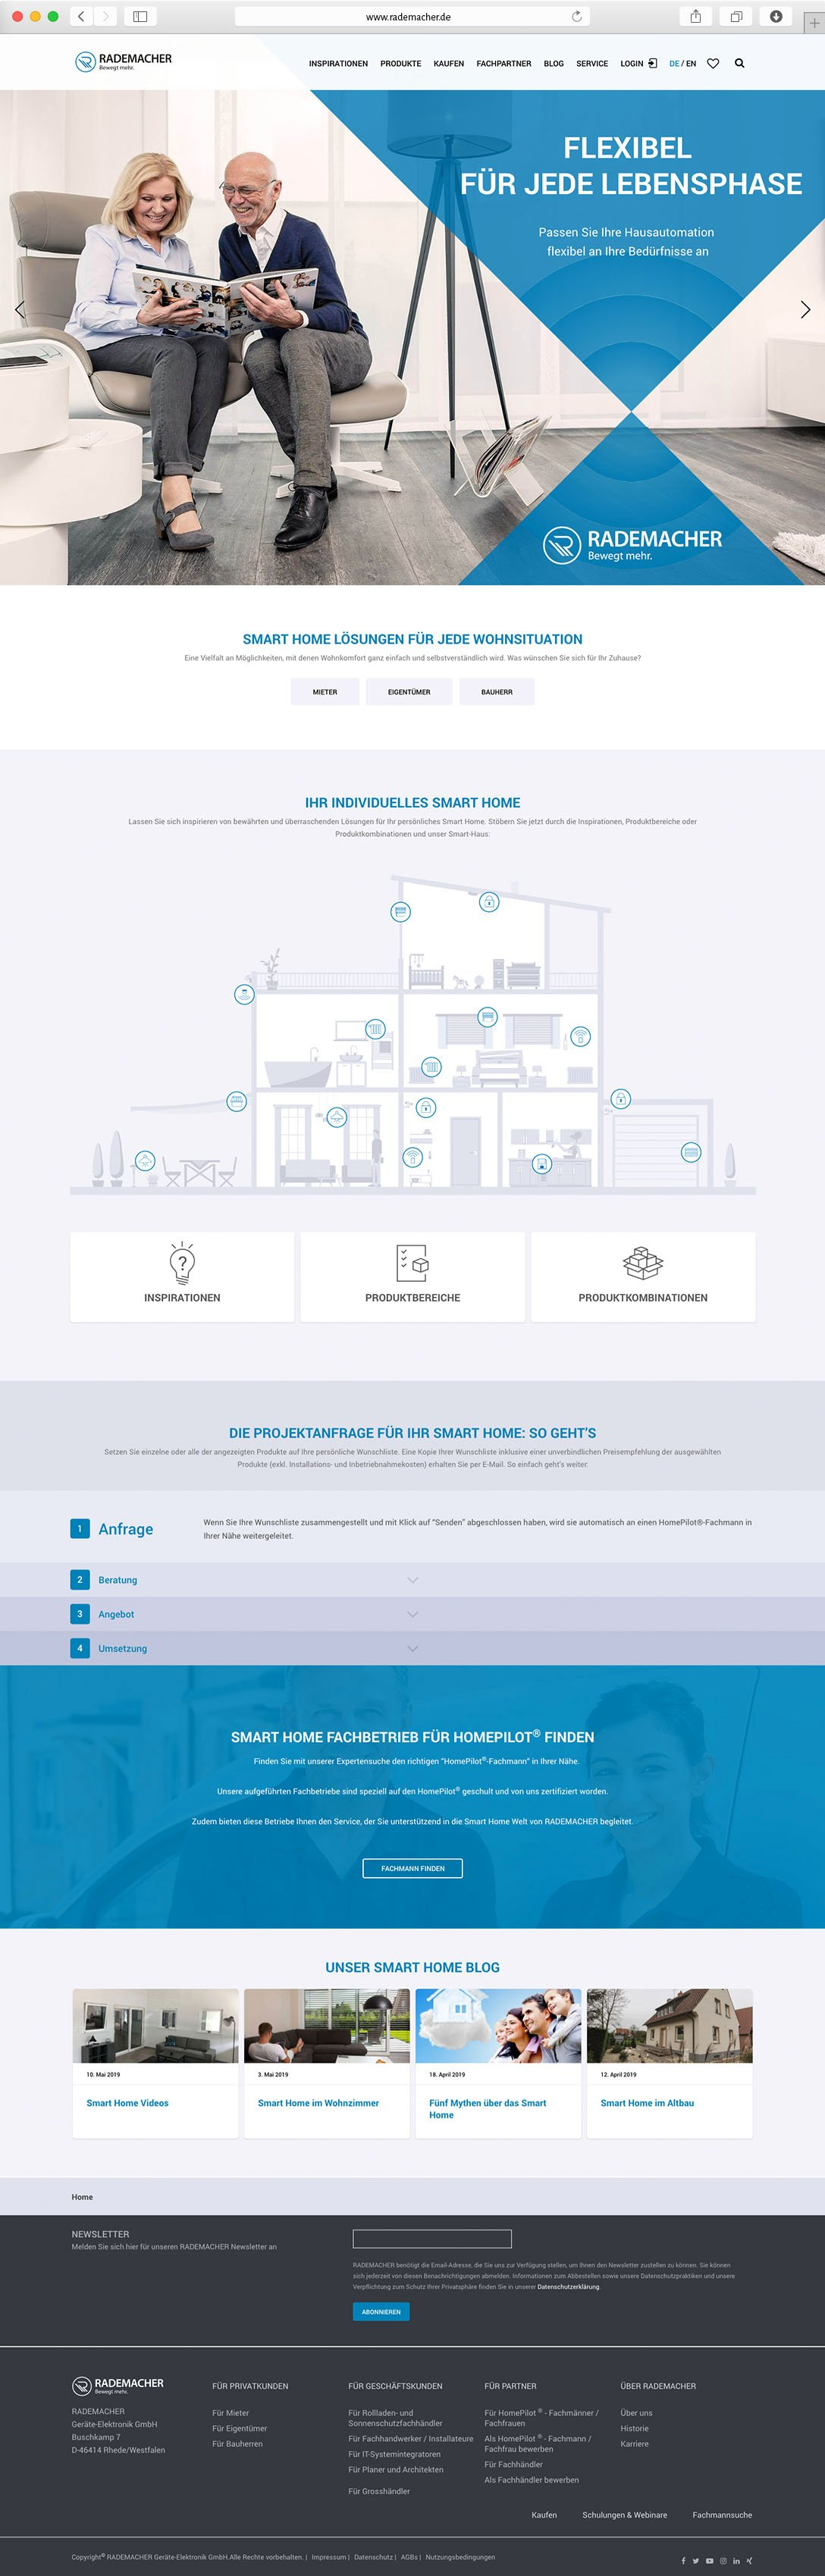 webdesign-bsp-rademacher-full